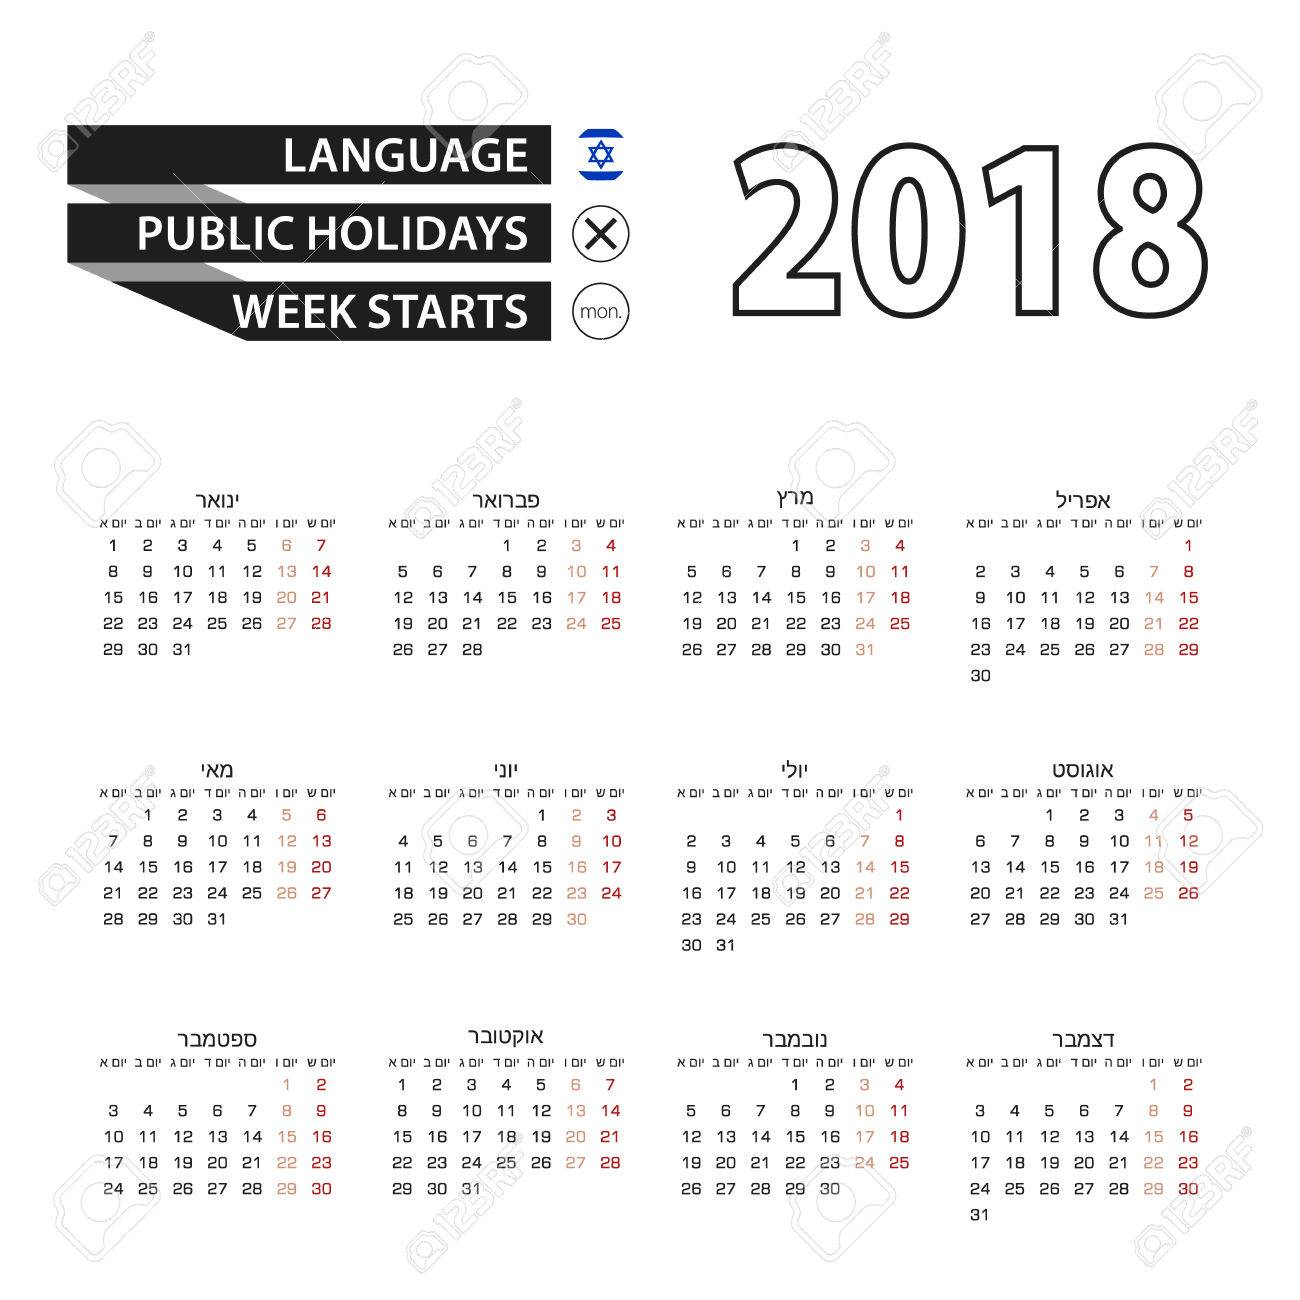 calendar 2018 on hebrew language week starts from monday simple calendar vector illustration